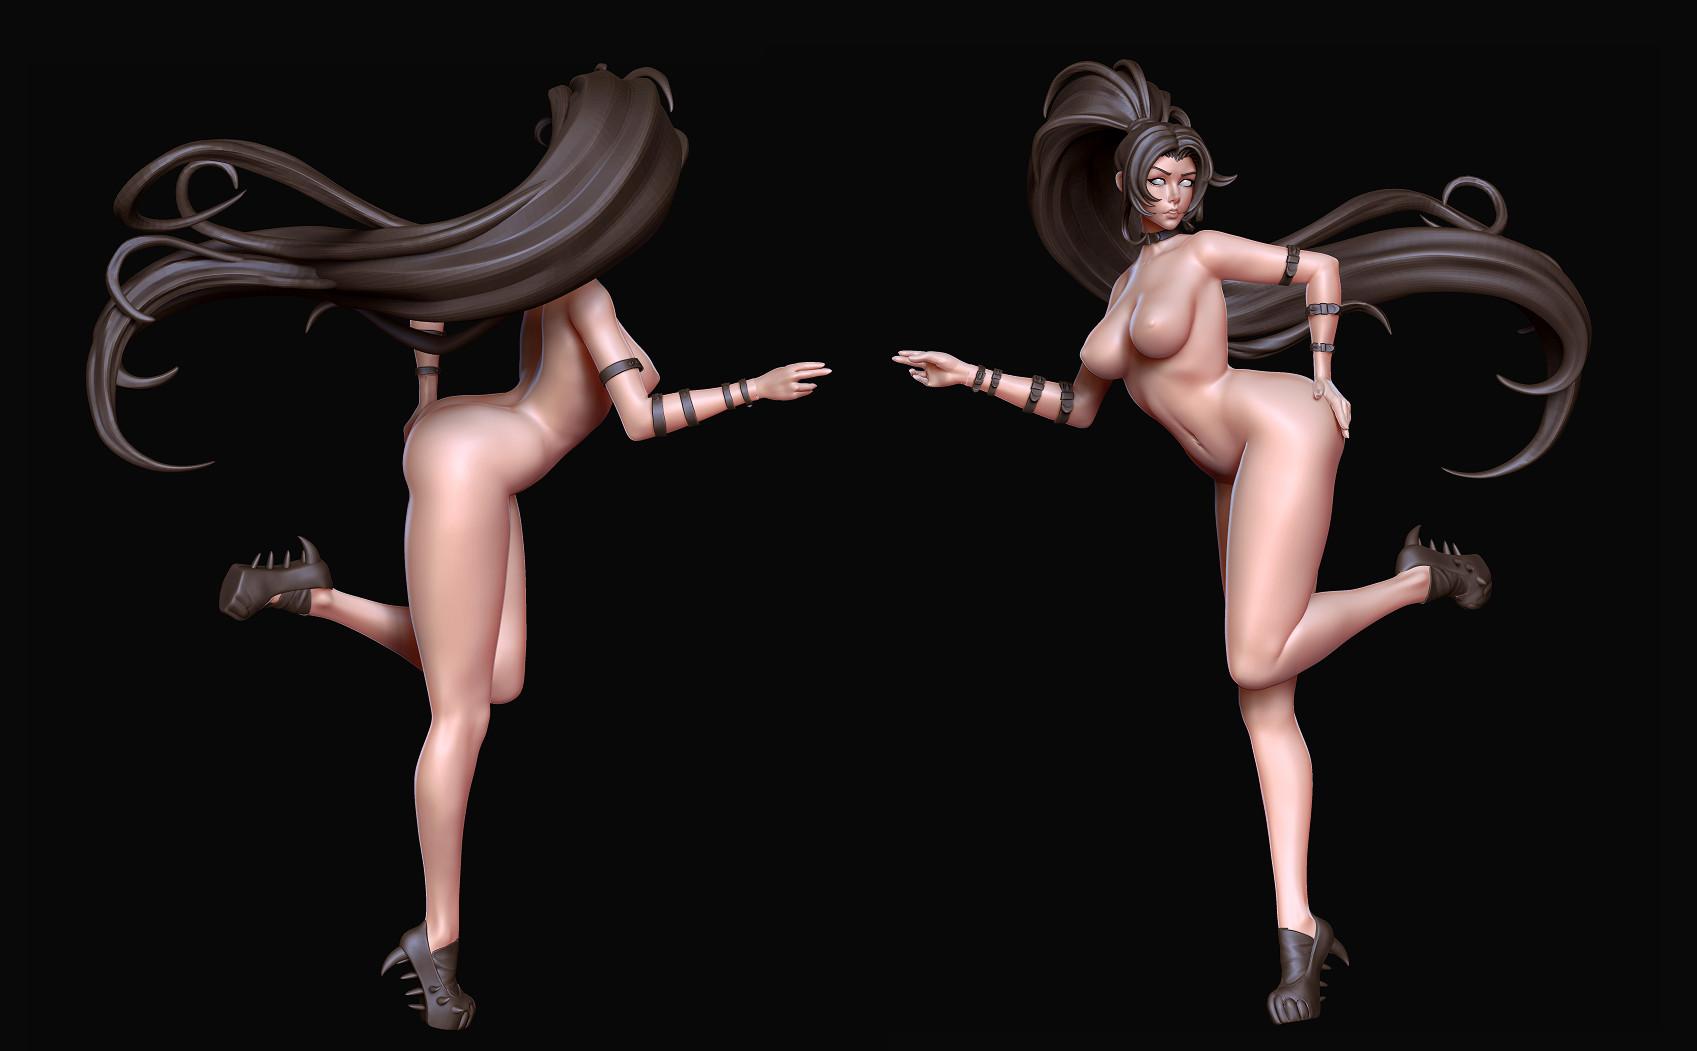 Layna lazar hammergirl wip 08 nude2